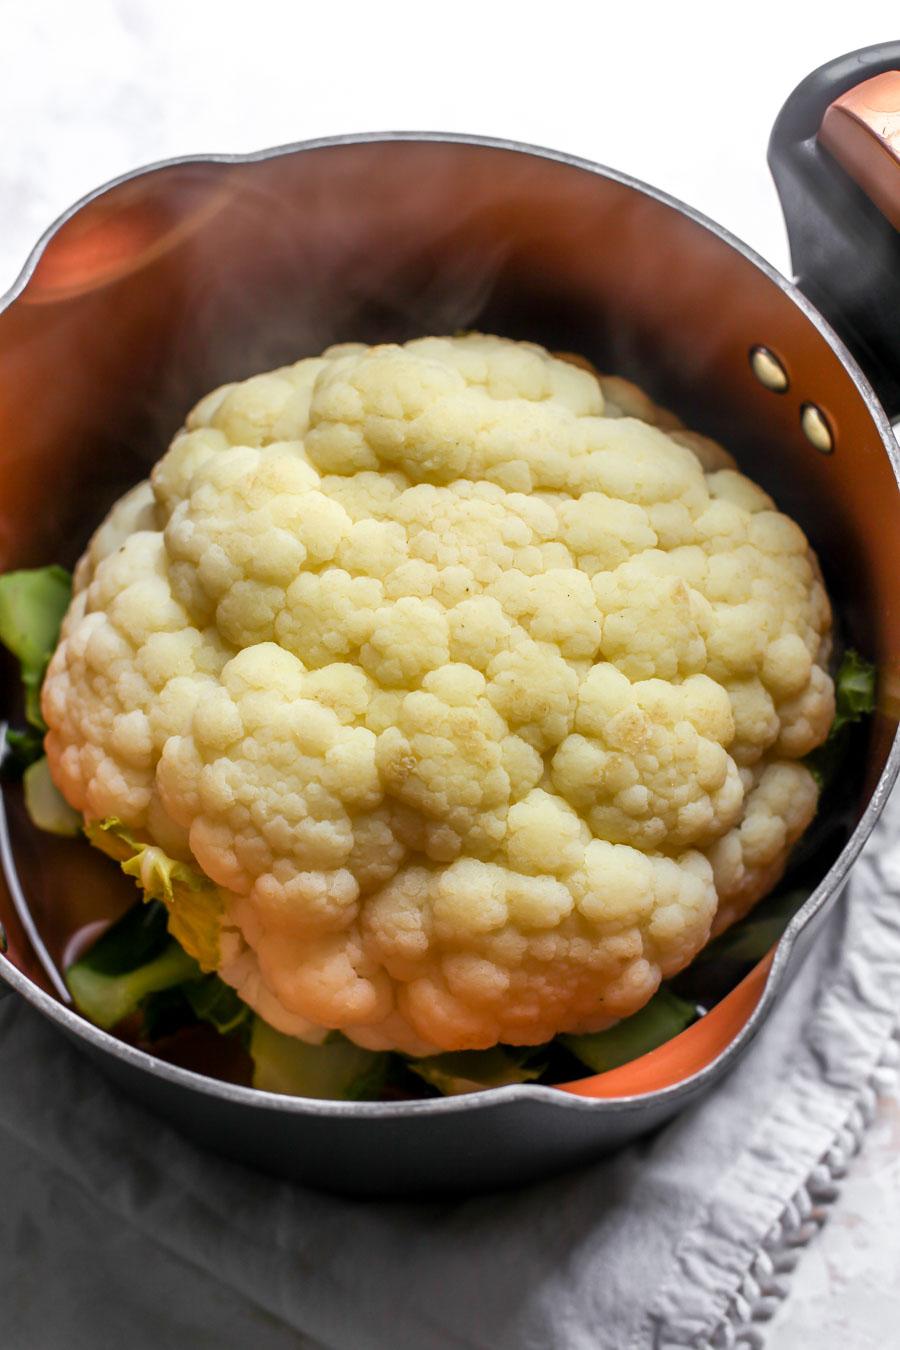 Pesto-Roasted Whole Cauliflower with Creamy Garlic Sauce